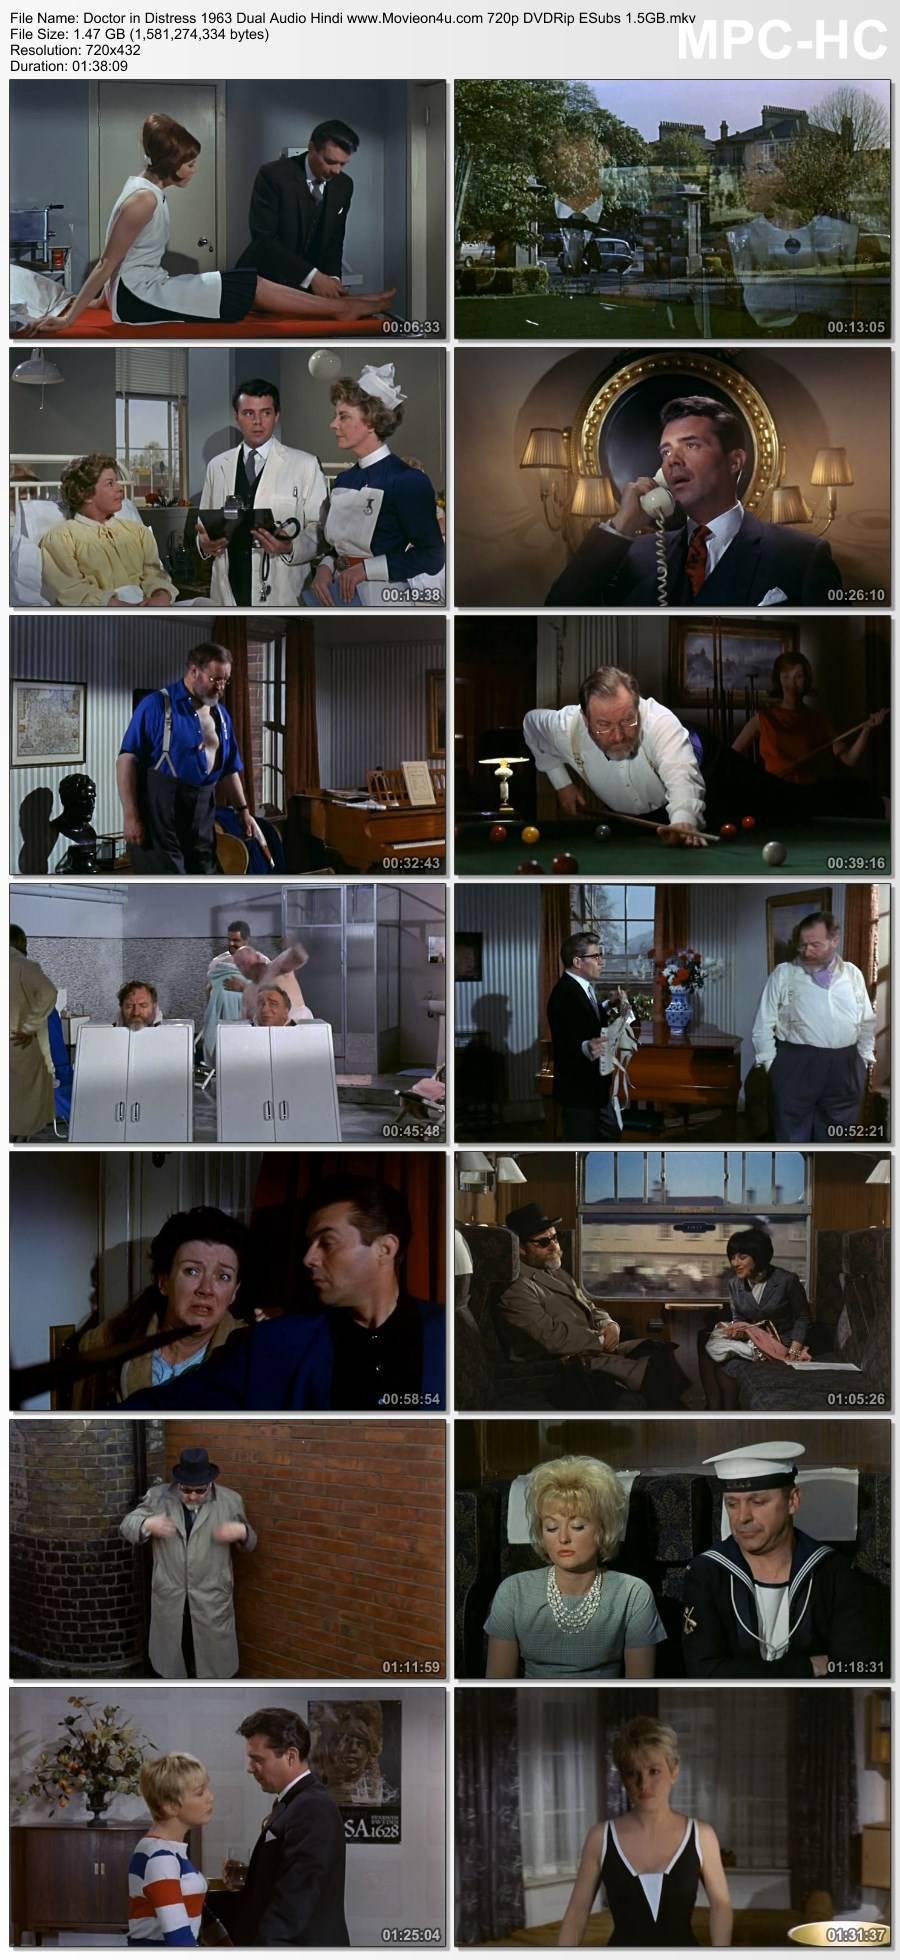 Doctor in Distress 1963 Dual Audio Hindi 720p DVDRip ESubs 1.5GB Download HD